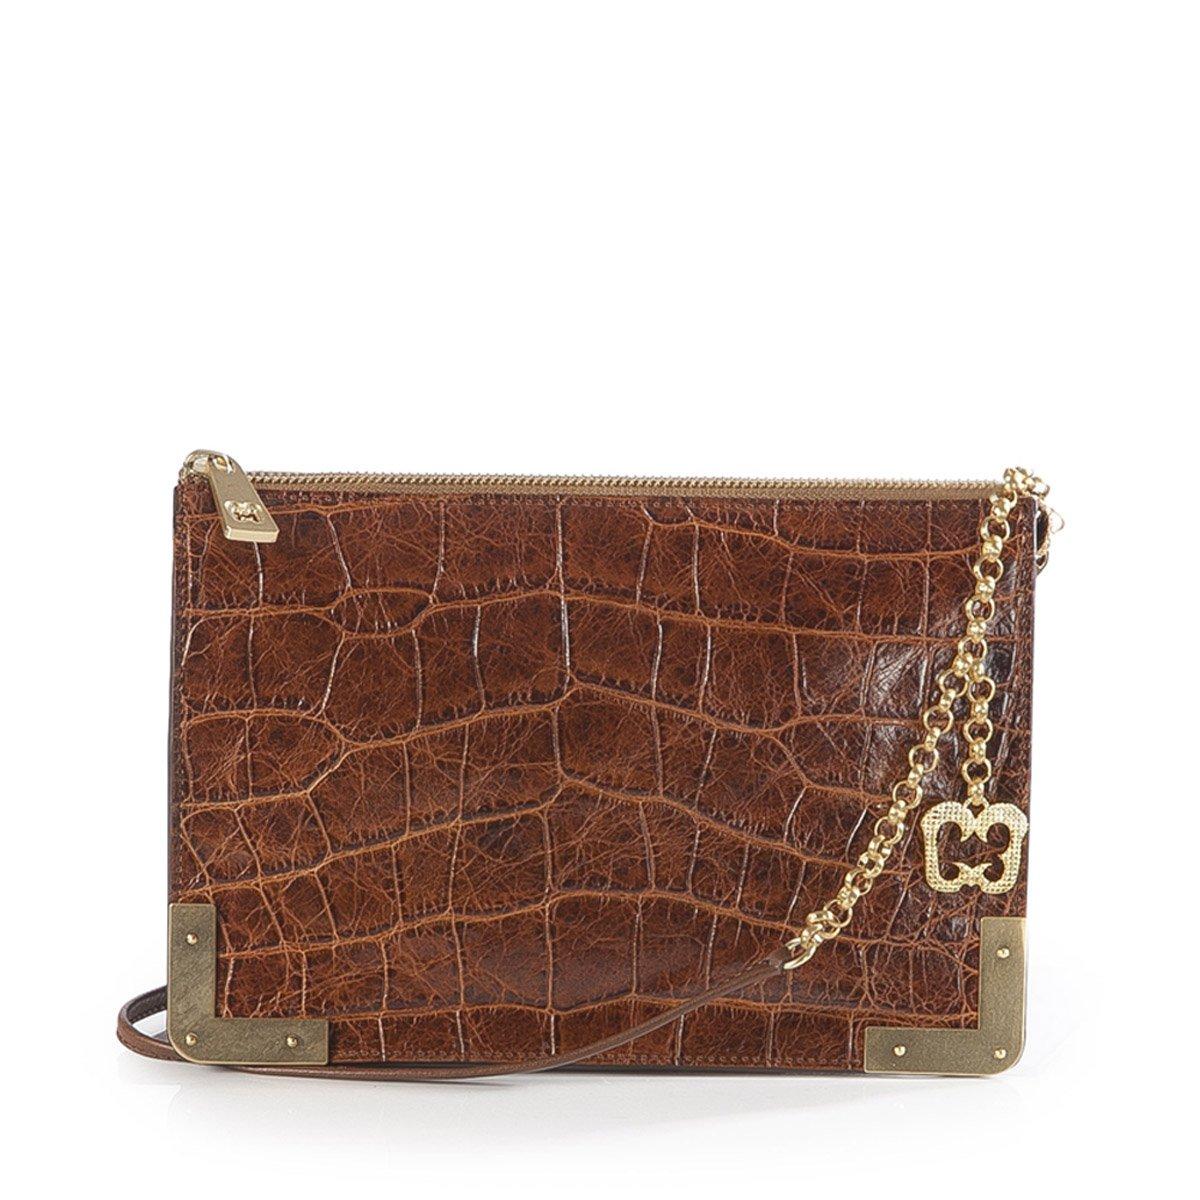 Eric Javits Luxury Fashion Designer Women's Handbag - Perkins II - Burnt